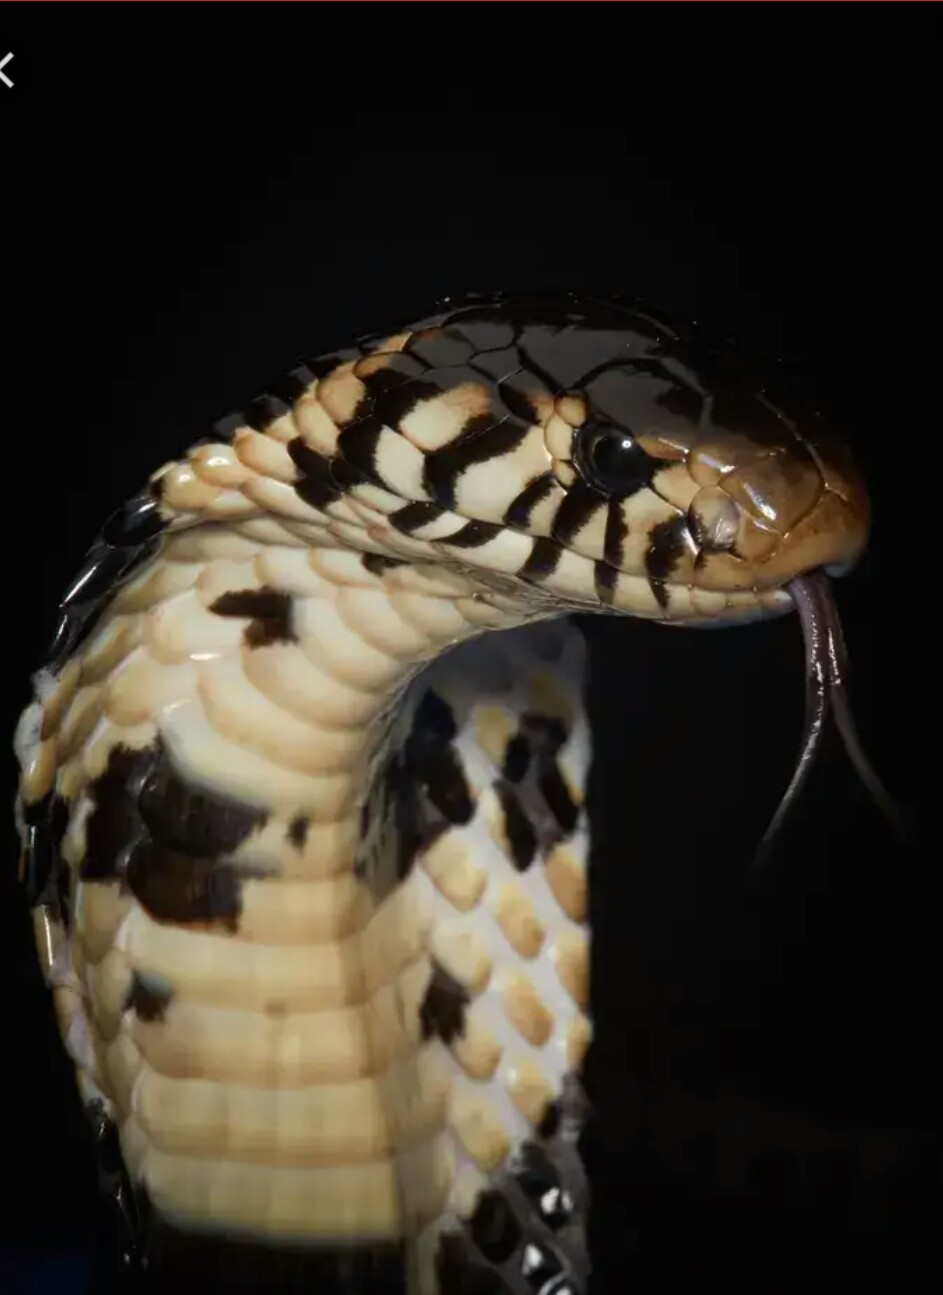 https://www.google.com/url?q=https://www.theguardian.com/global-development/2019/sep/09/how-snakebites-became-an-invisible-health-crisis-in-congo&sa=U&ved=0ahUKEwj5zNTJp5TtAhWB66QKHTkqD1o4ZBCviQMIKQ&usg=AOvVaw3YiUrGTGiQWX6VQWTr8Sda